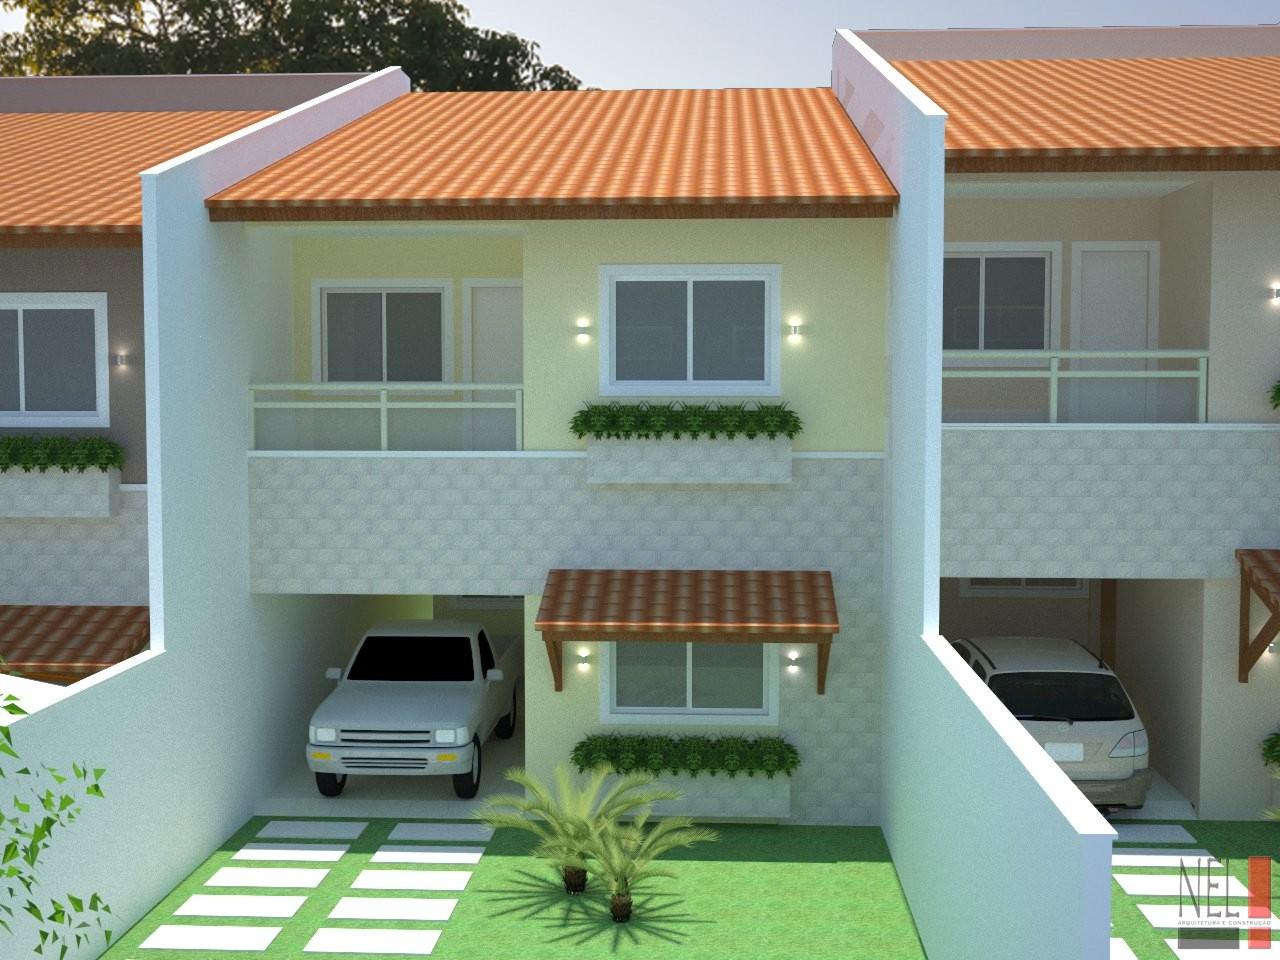 Fachadas de casas geminadas e modernas fotos decorando casas for Casas bonitas modernas